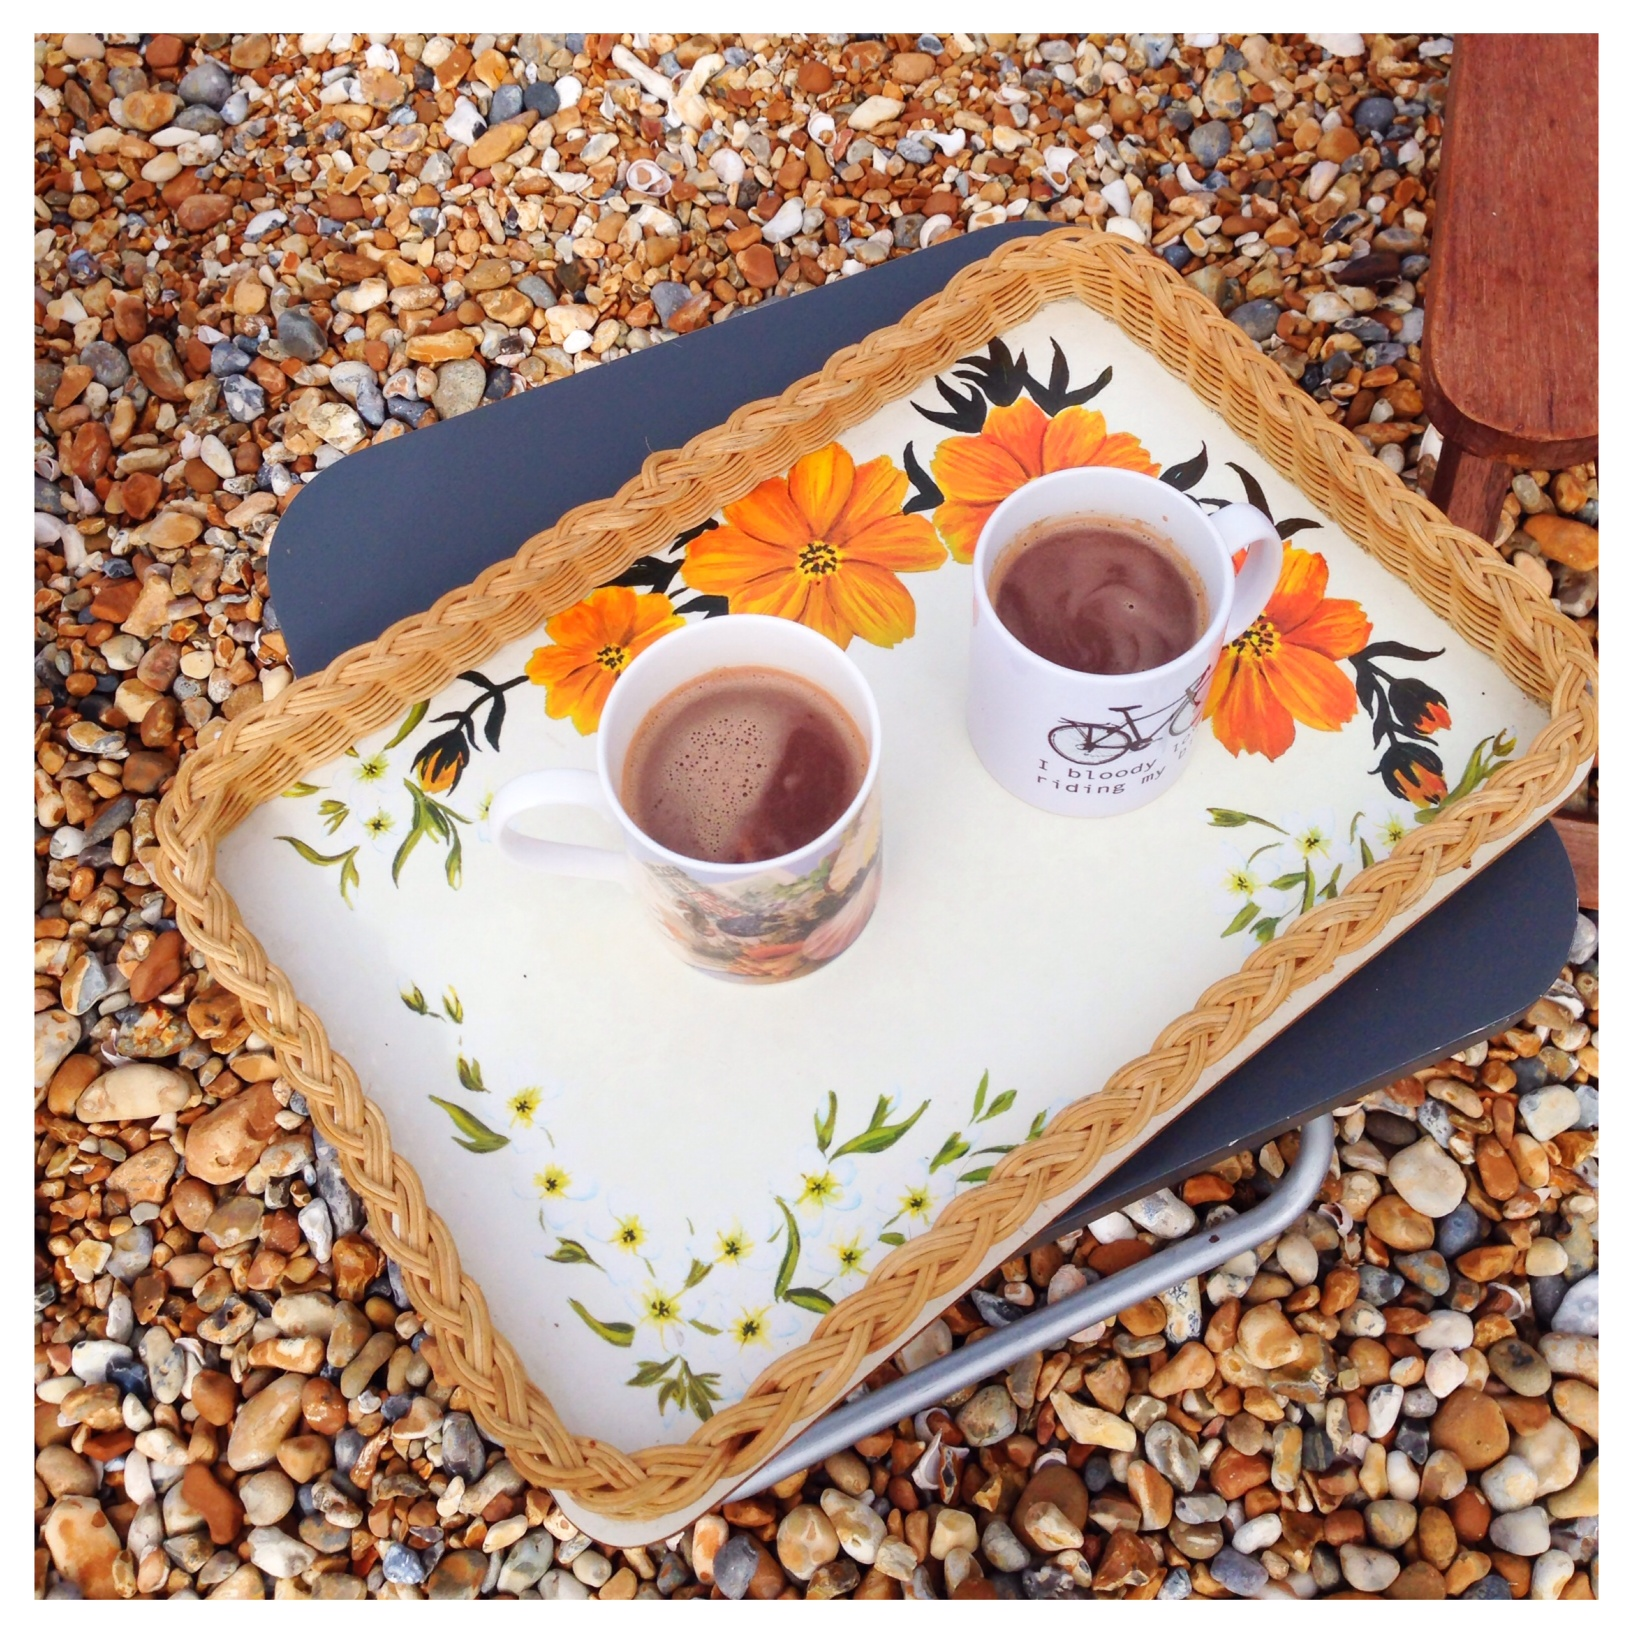 Beachhutcook's Orange and Geranium Hot Chocolate